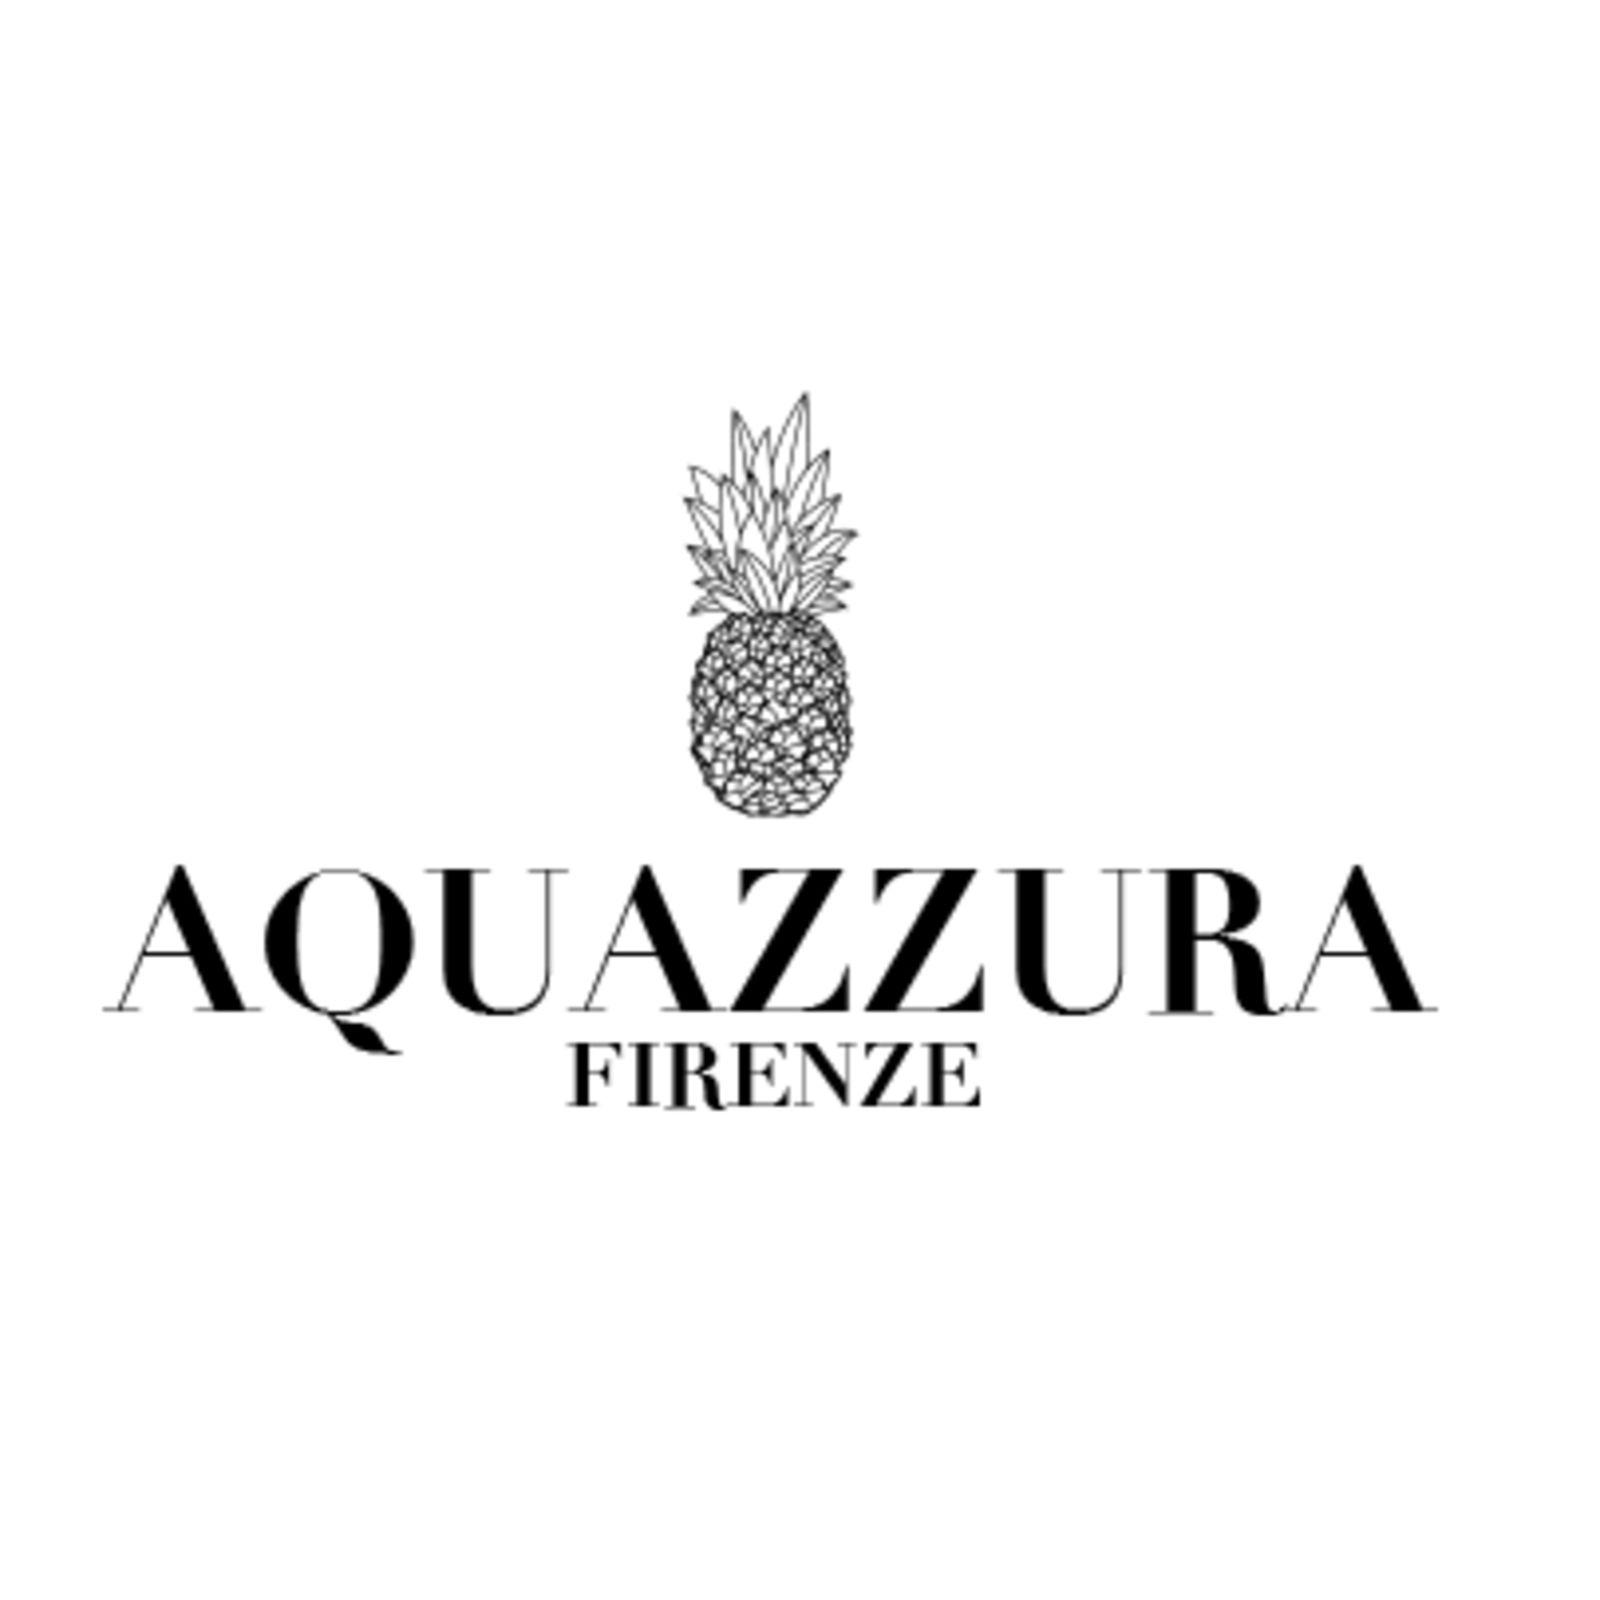 AQUAZZURA (Image 1)